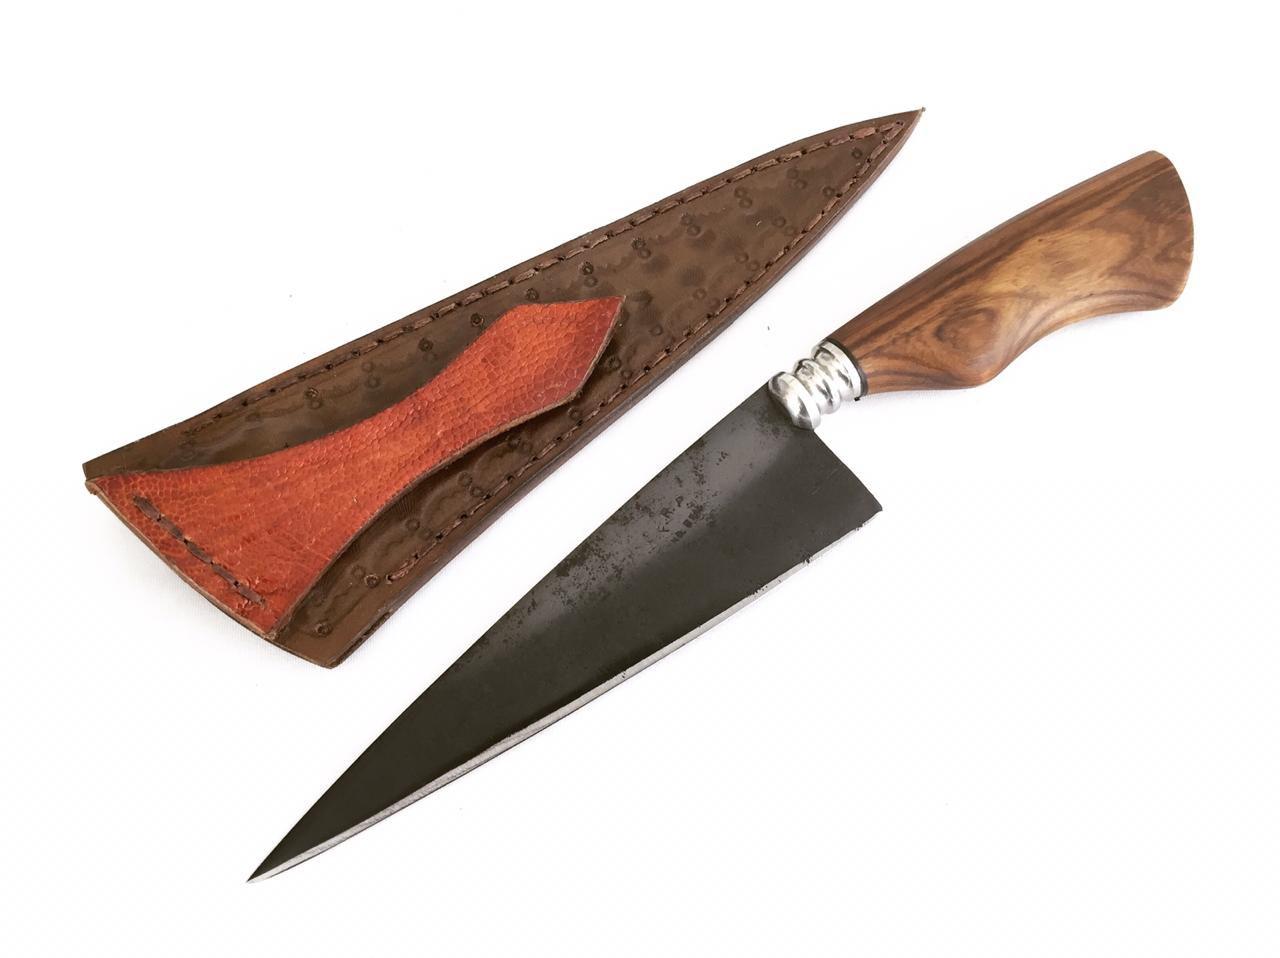 Faca artesanal tesoura de tosquia Herval